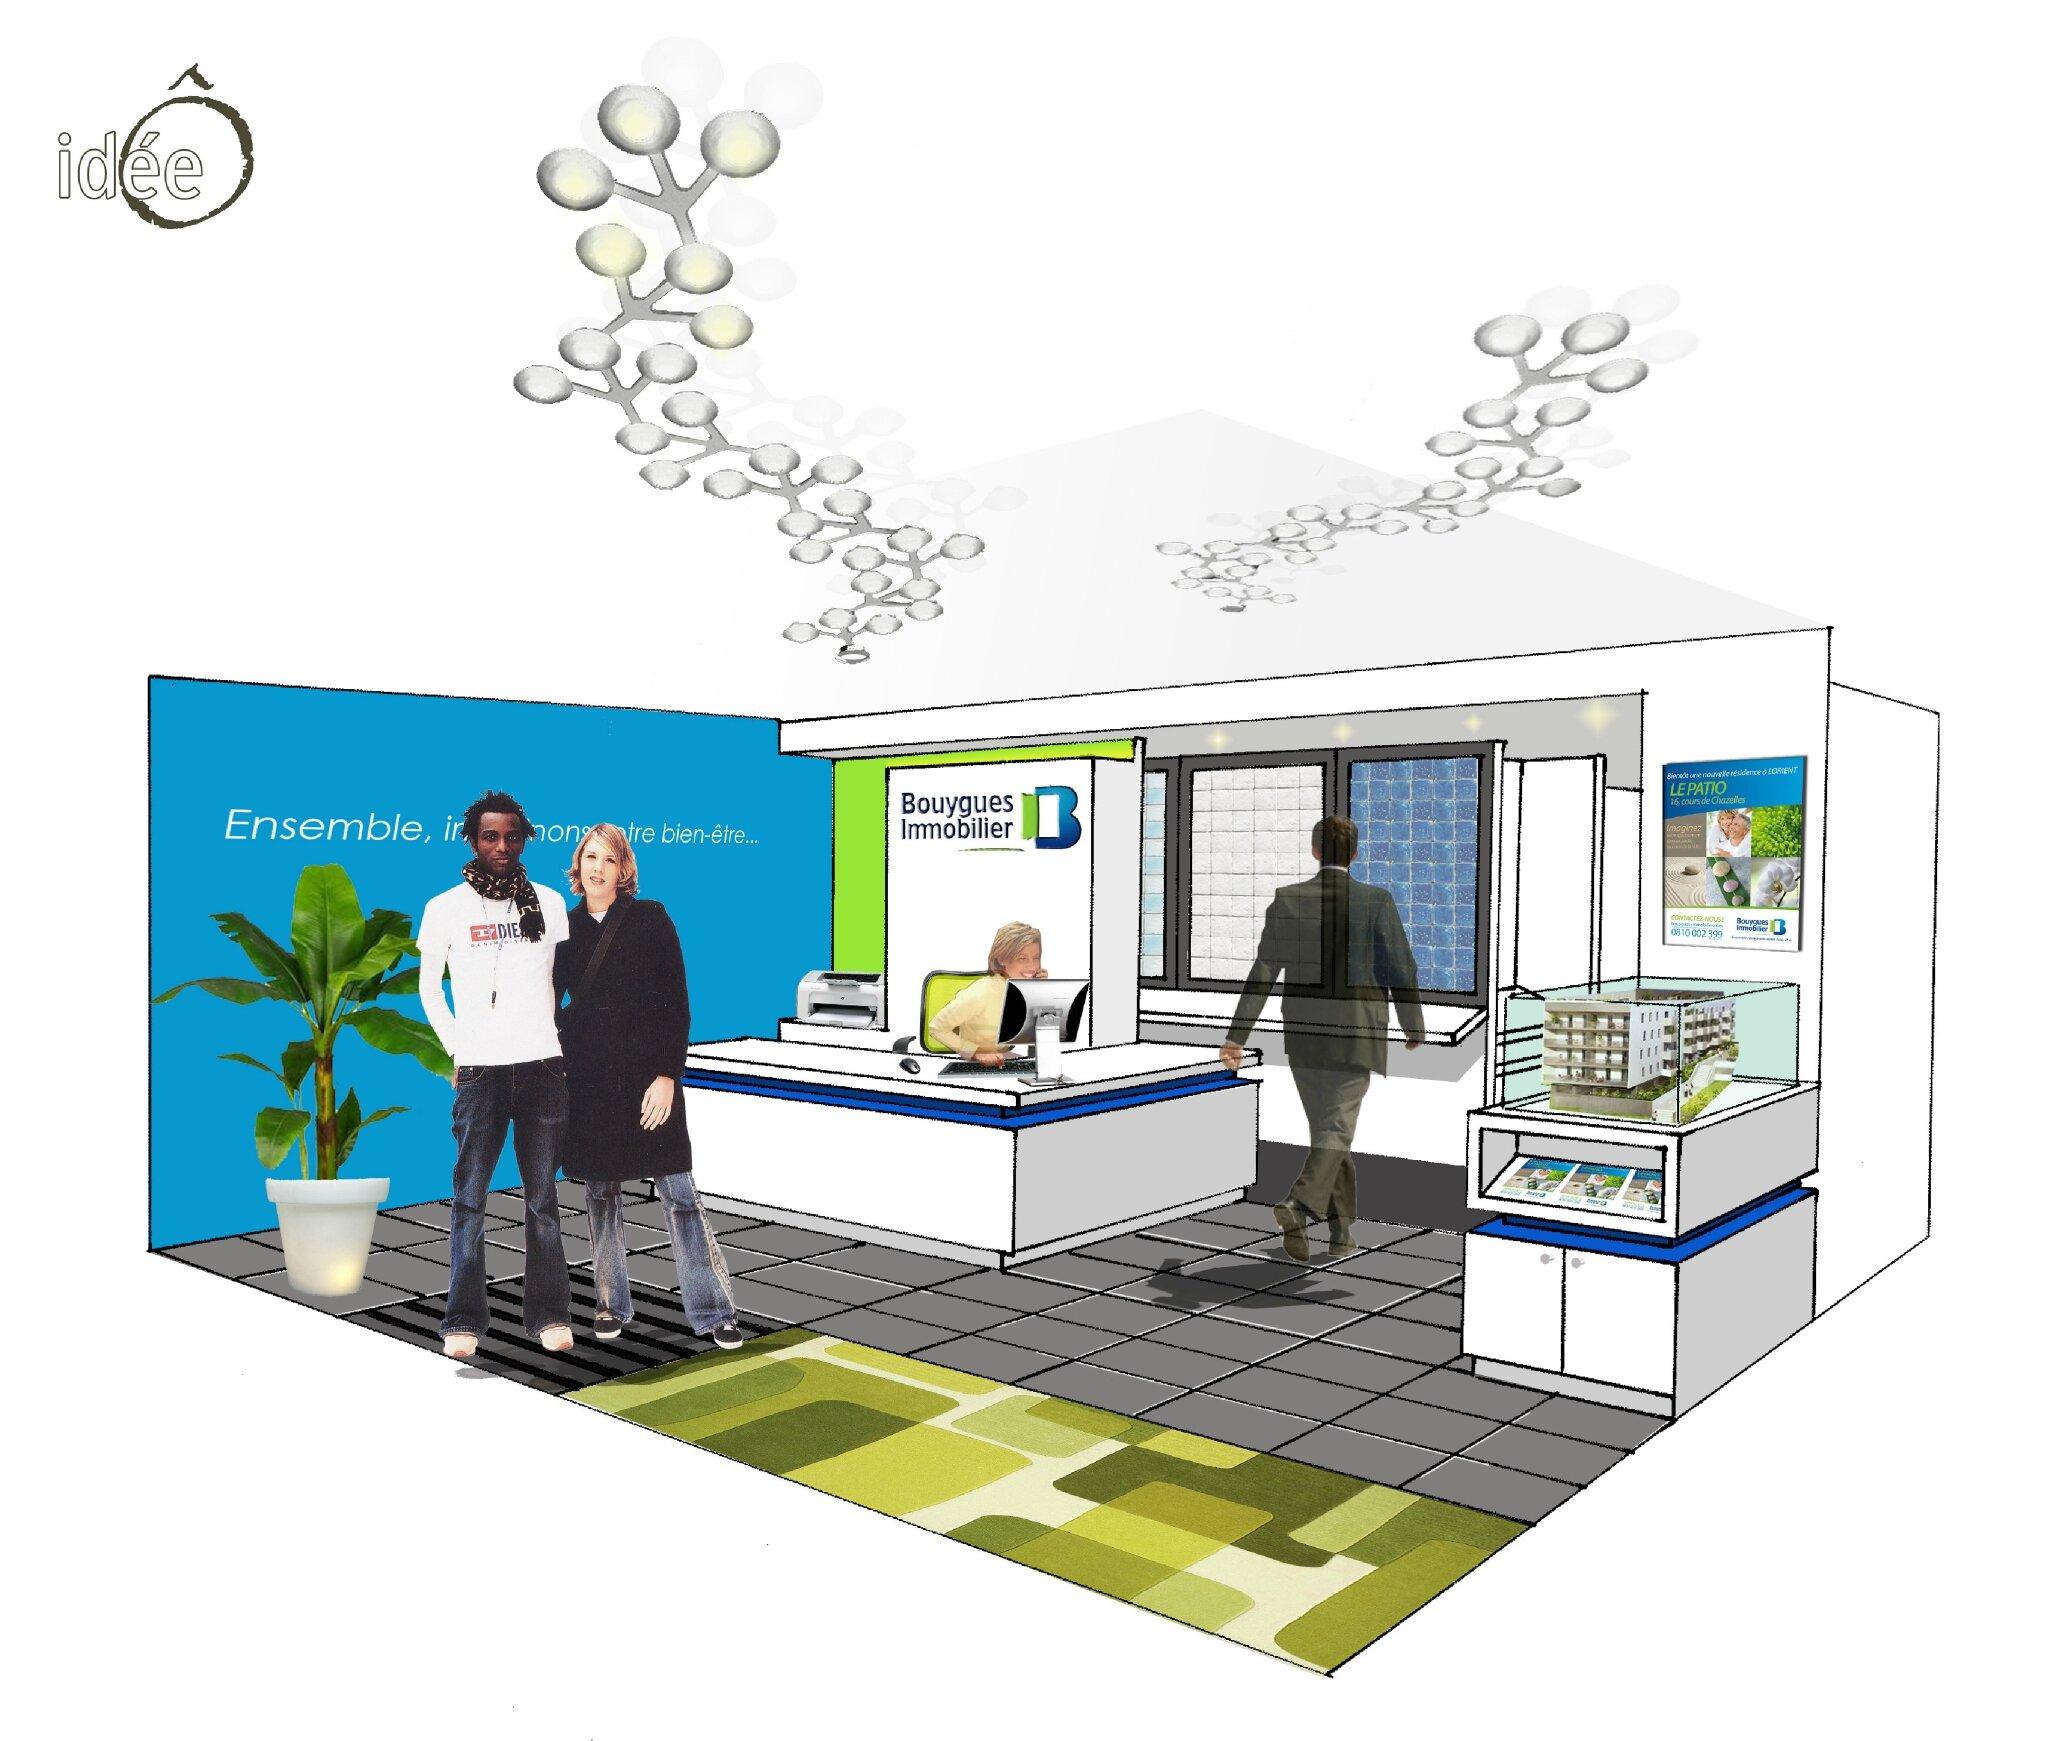 bouygues immobilier showroom rennes 35 2012 atelier id e architecte d 39 int rieur. Black Bedroom Furniture Sets. Home Design Ideas